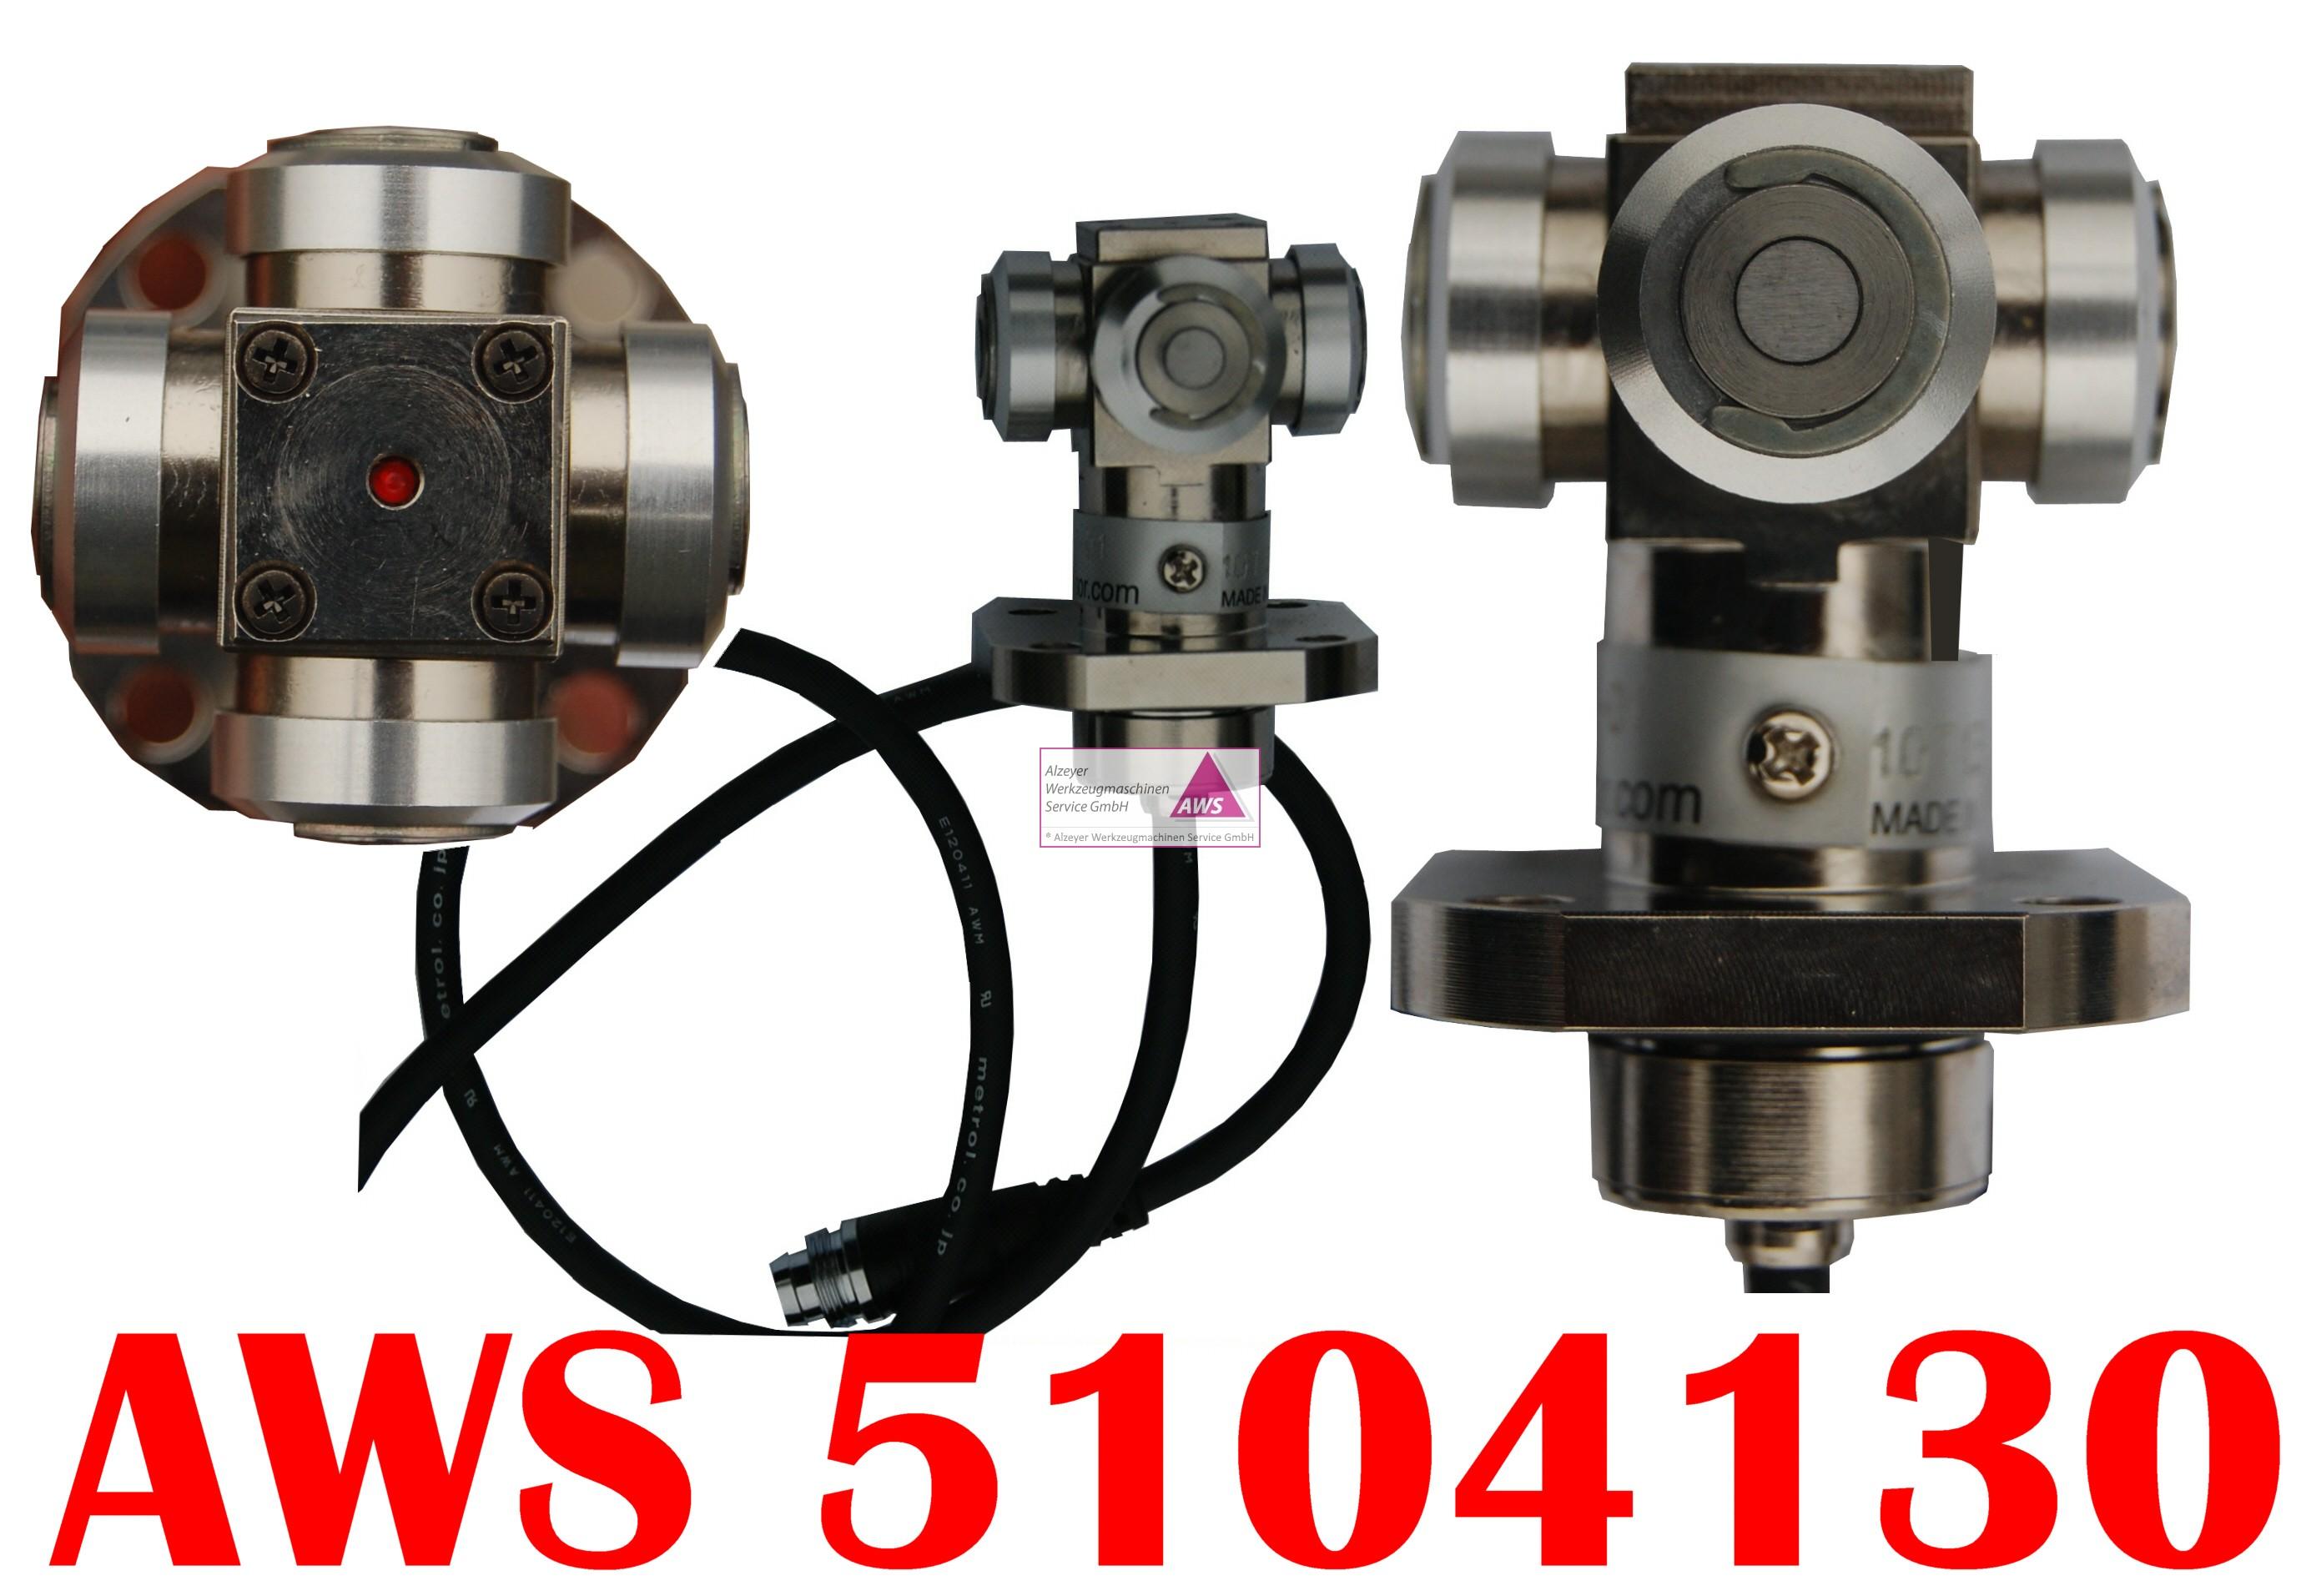 Tooleye METROL Typ H4A-53-01H (neuer Typ)